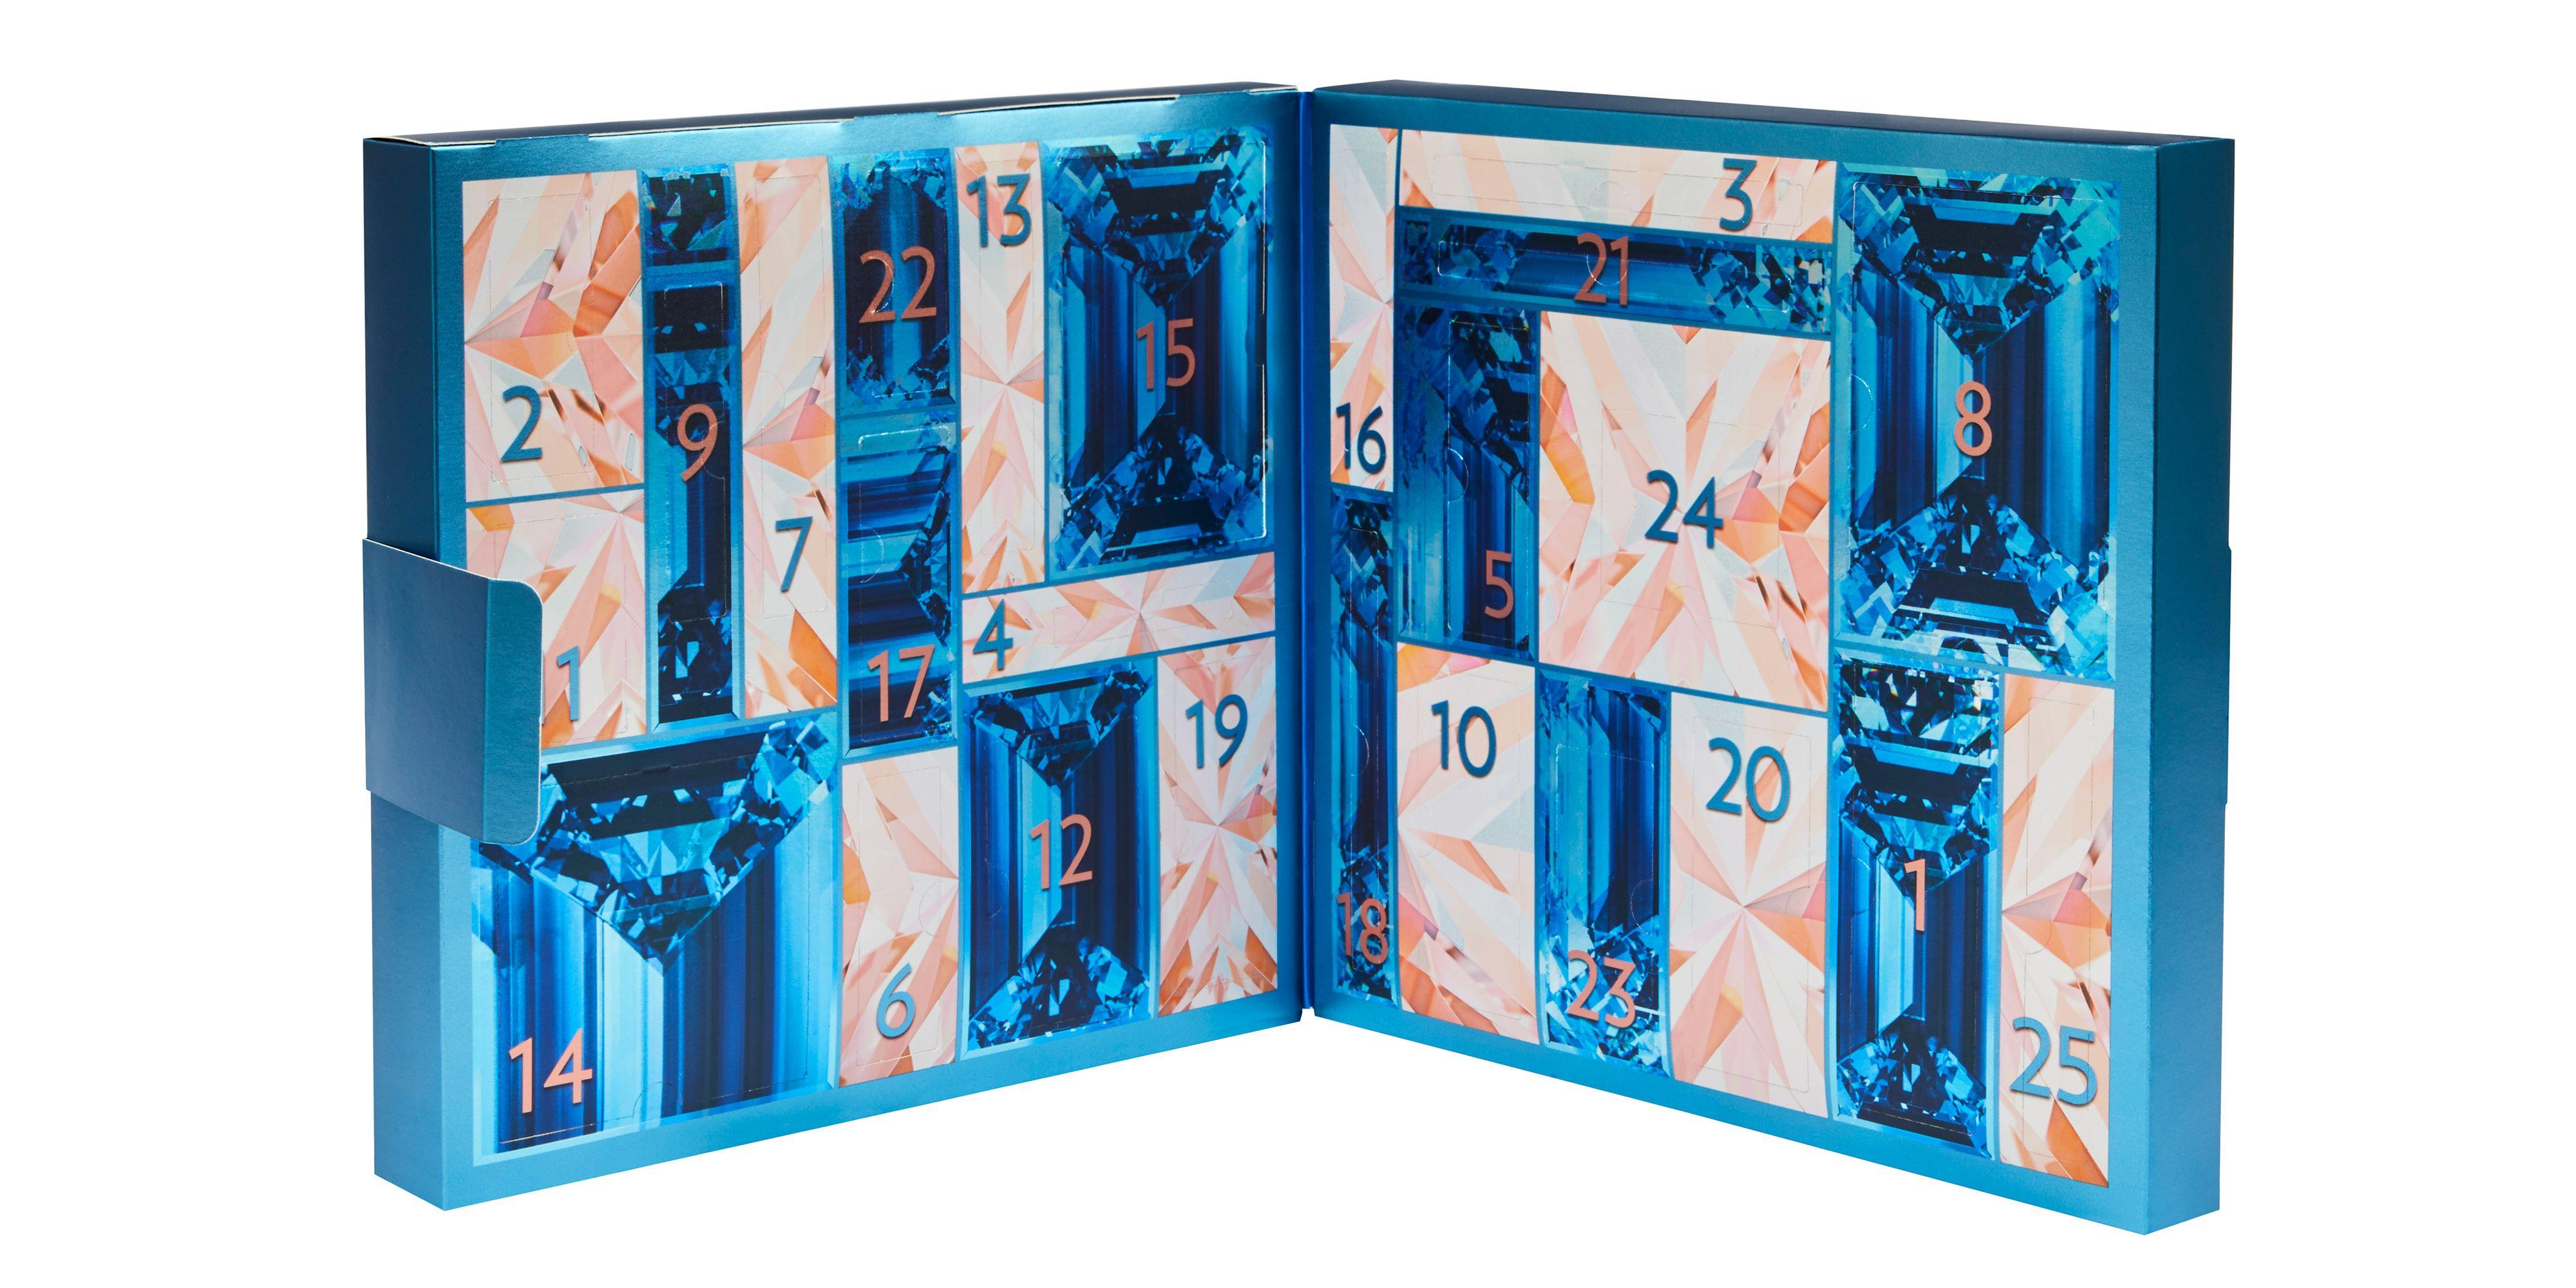 No7's Beauty Advent Calendar Contains Golden Tickets